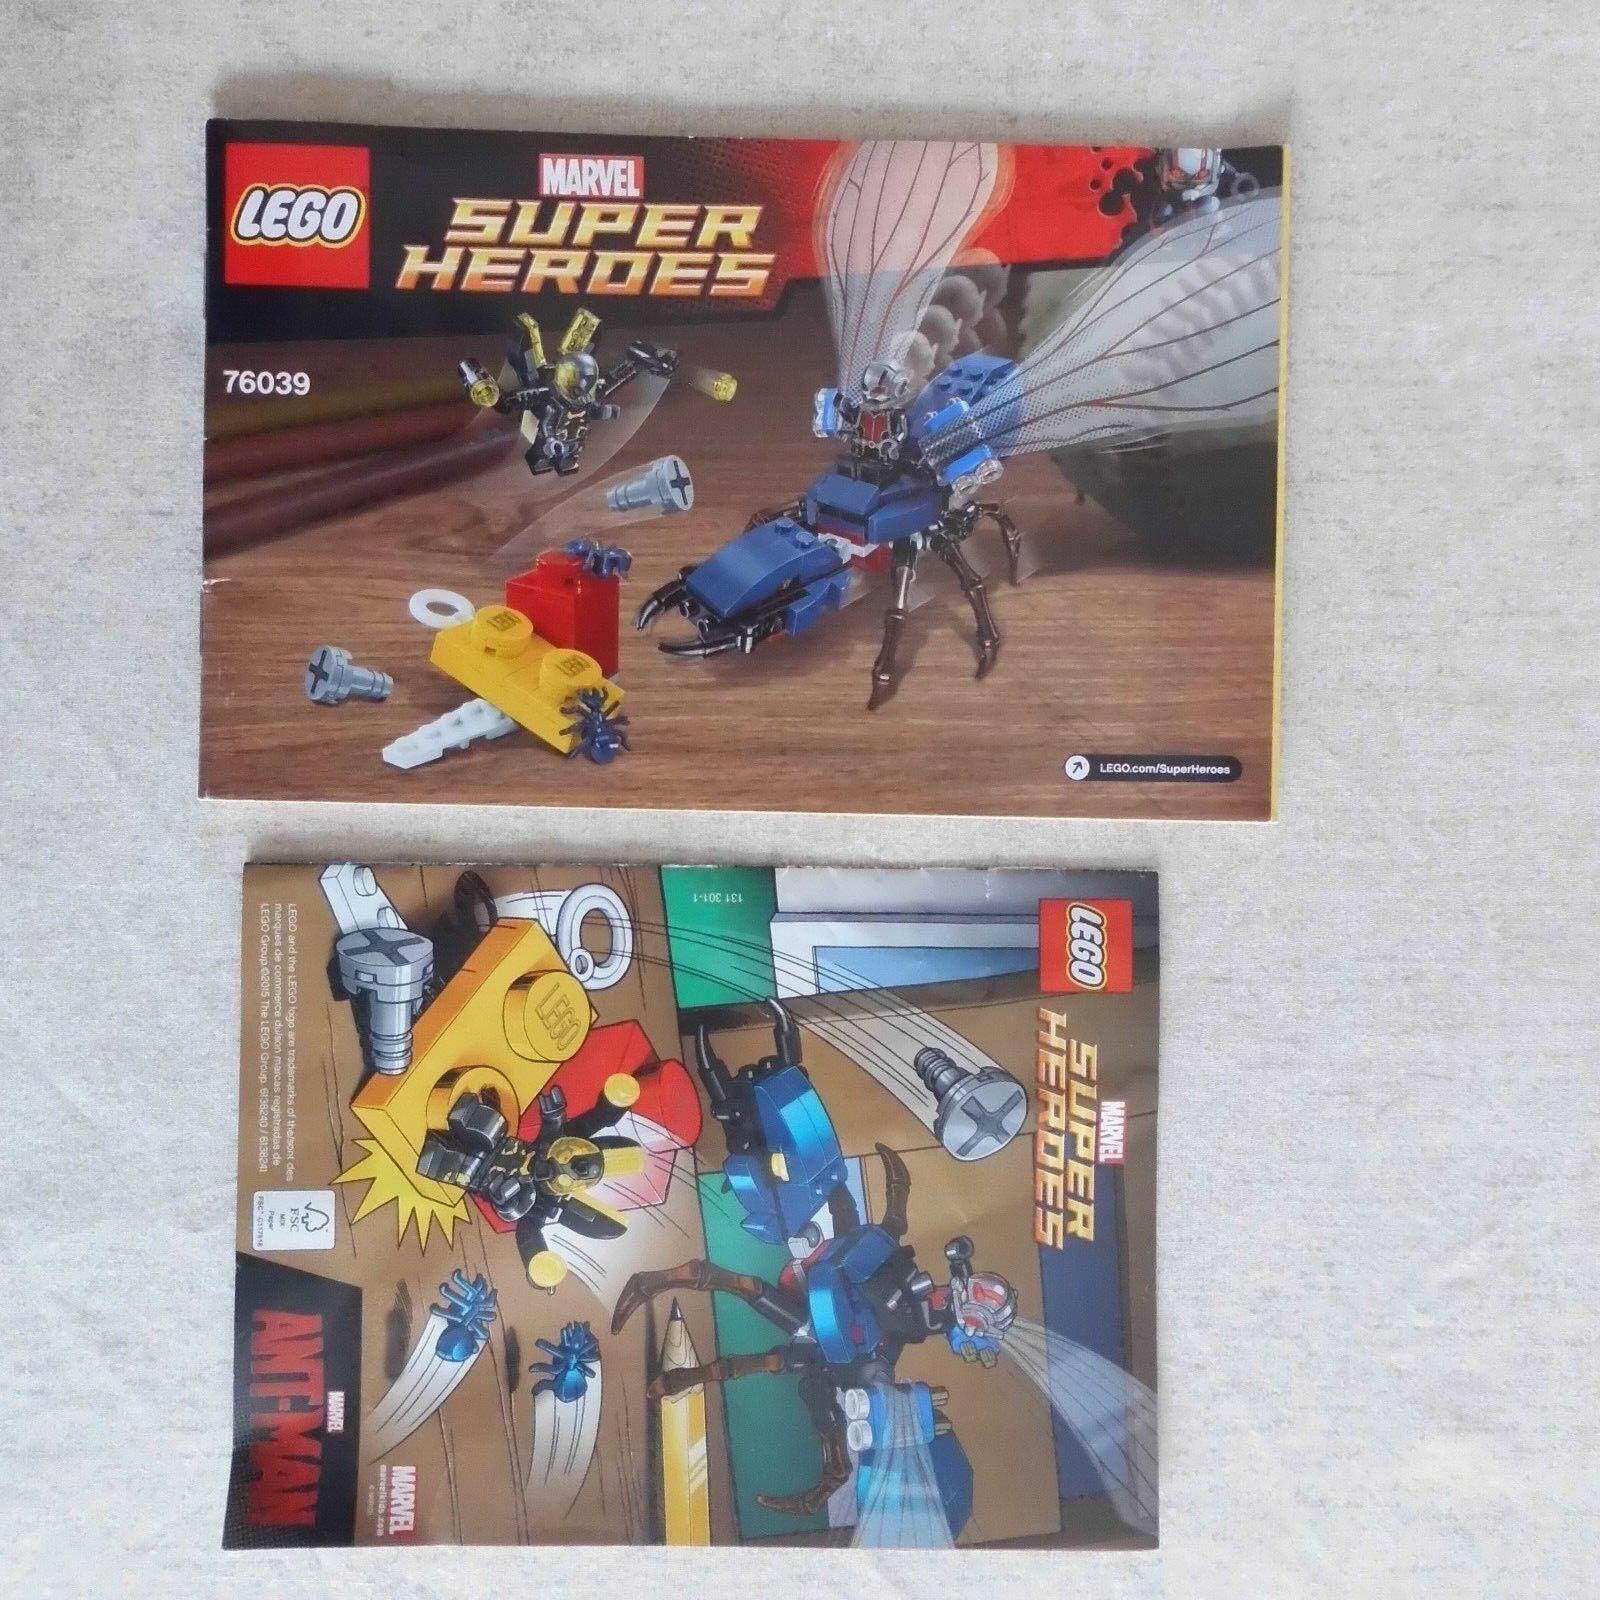 Lego Lego Lego 76039 Super Heroes ANT-MAN bataille finale avec LEGO Comic book bf9b20